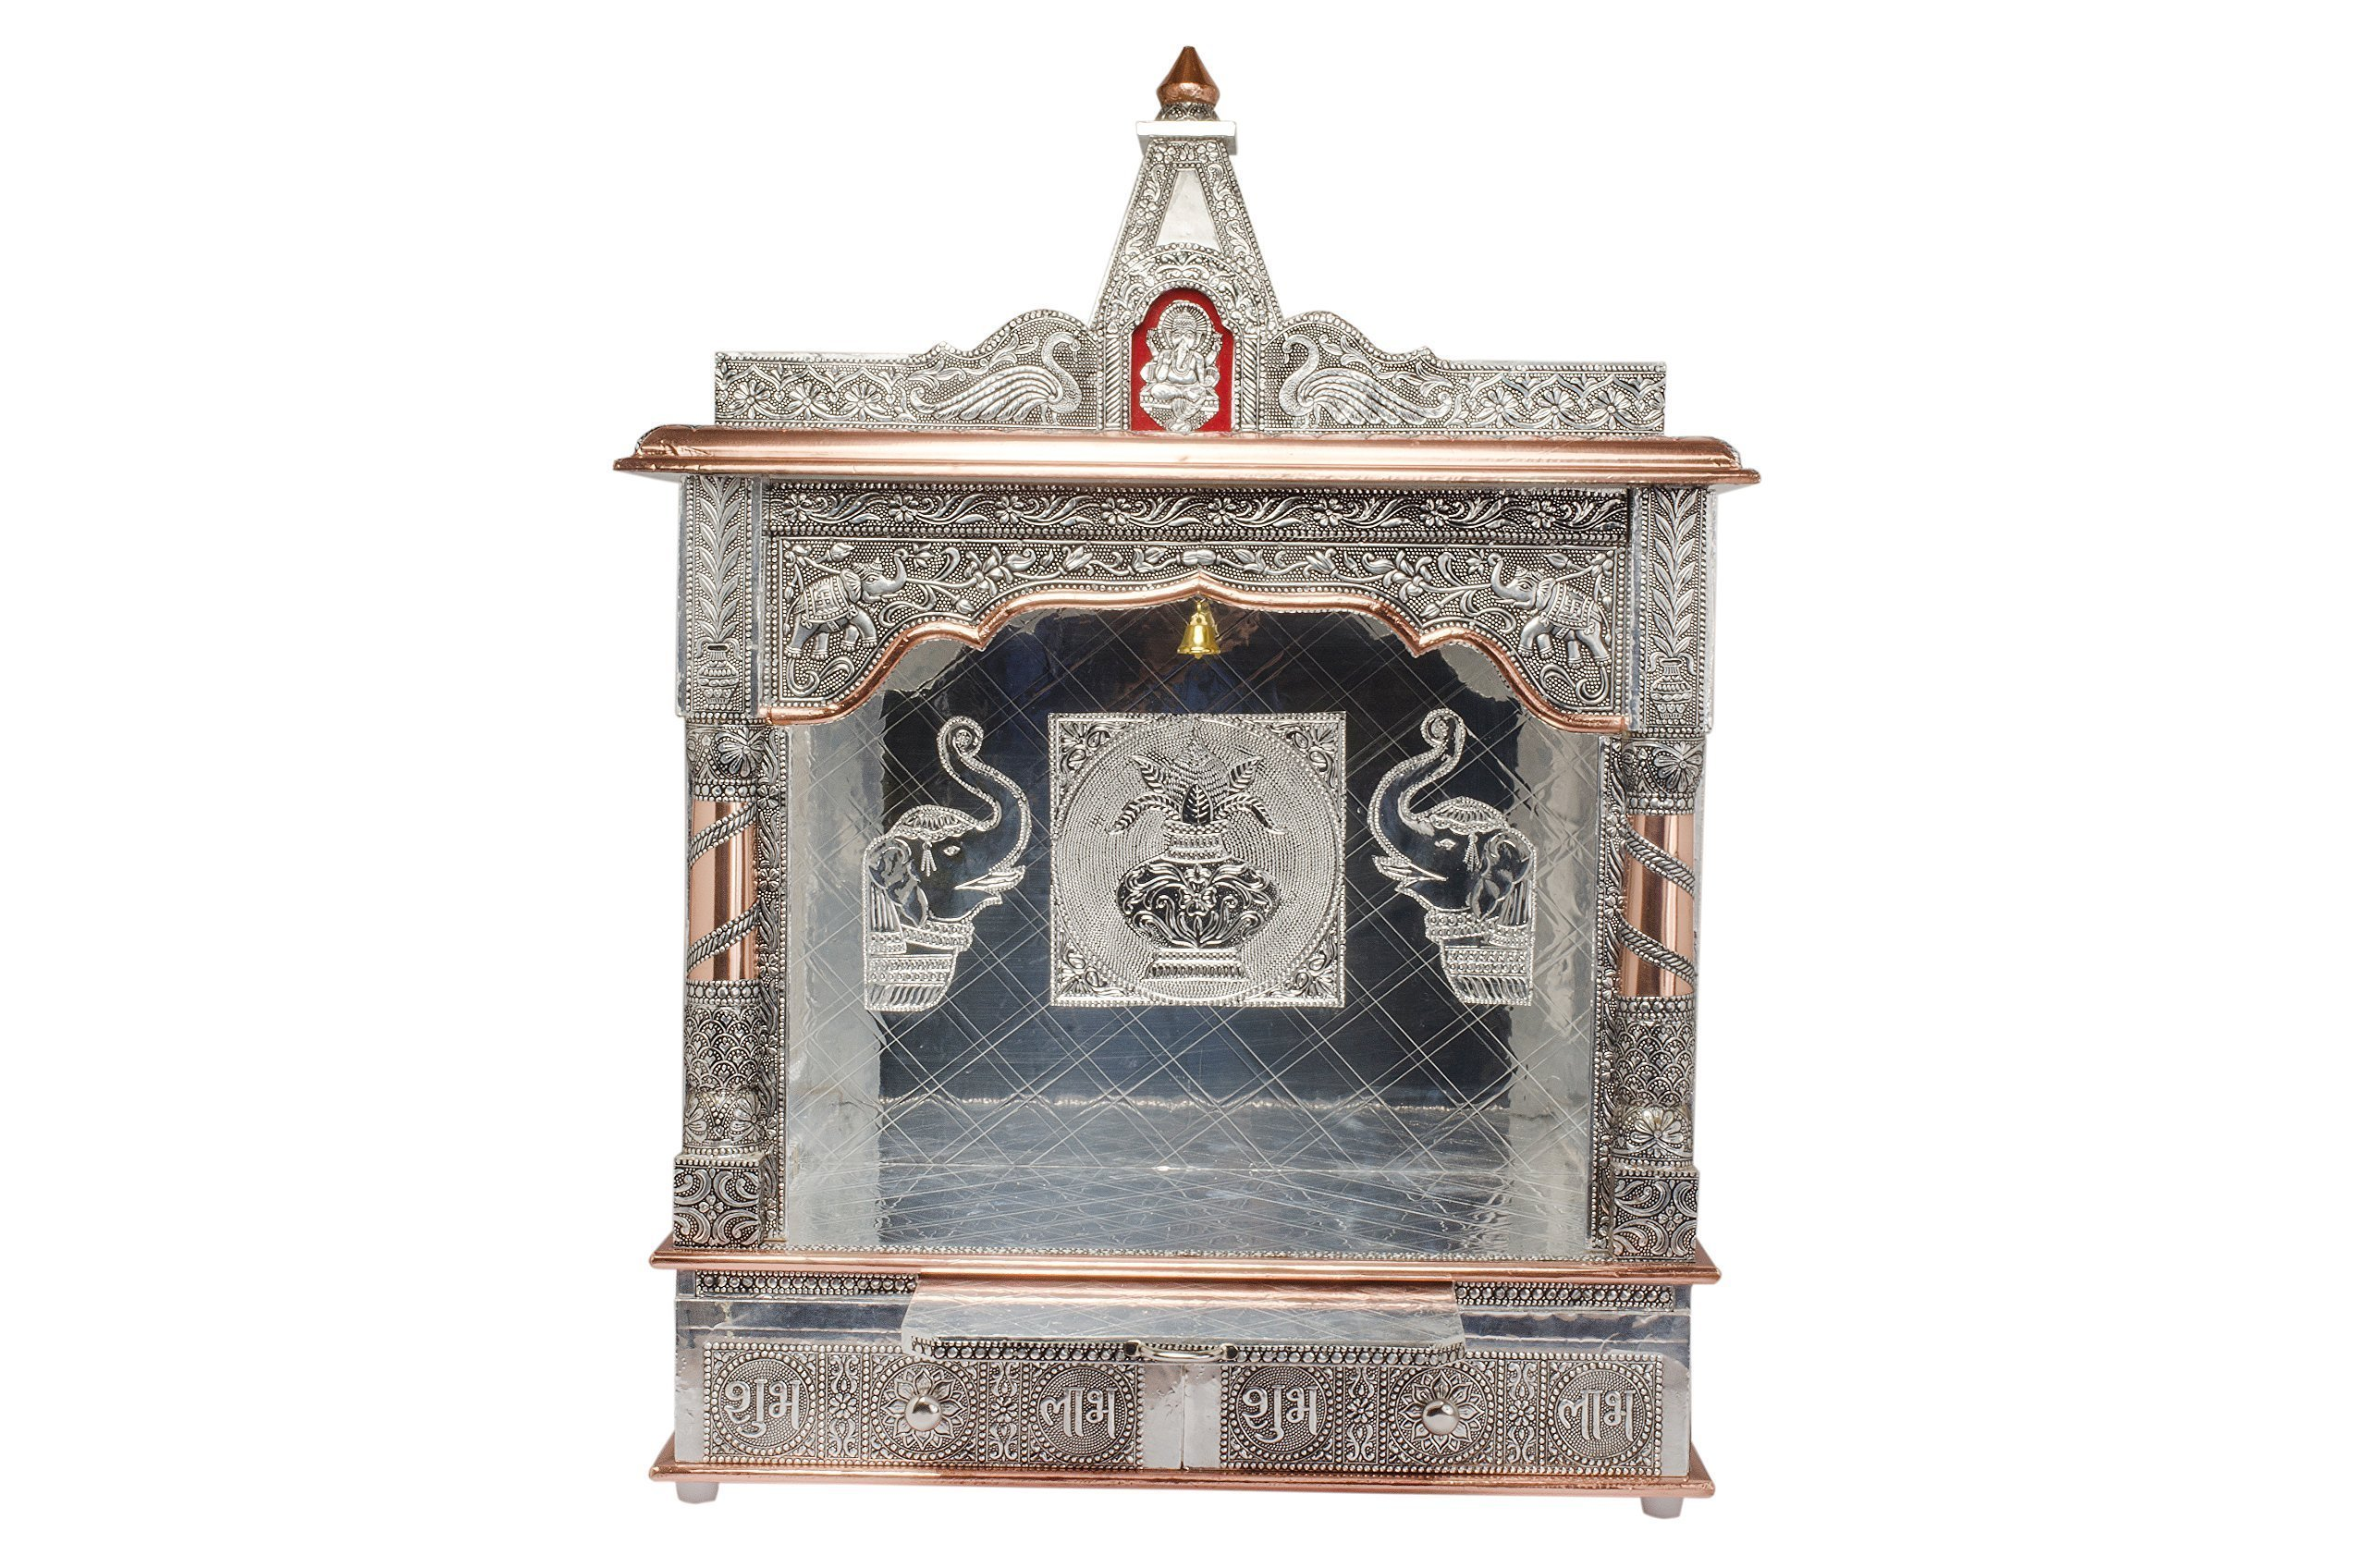 Movie Time Vdieo Hindu Puja Mandir/Temple/Alter